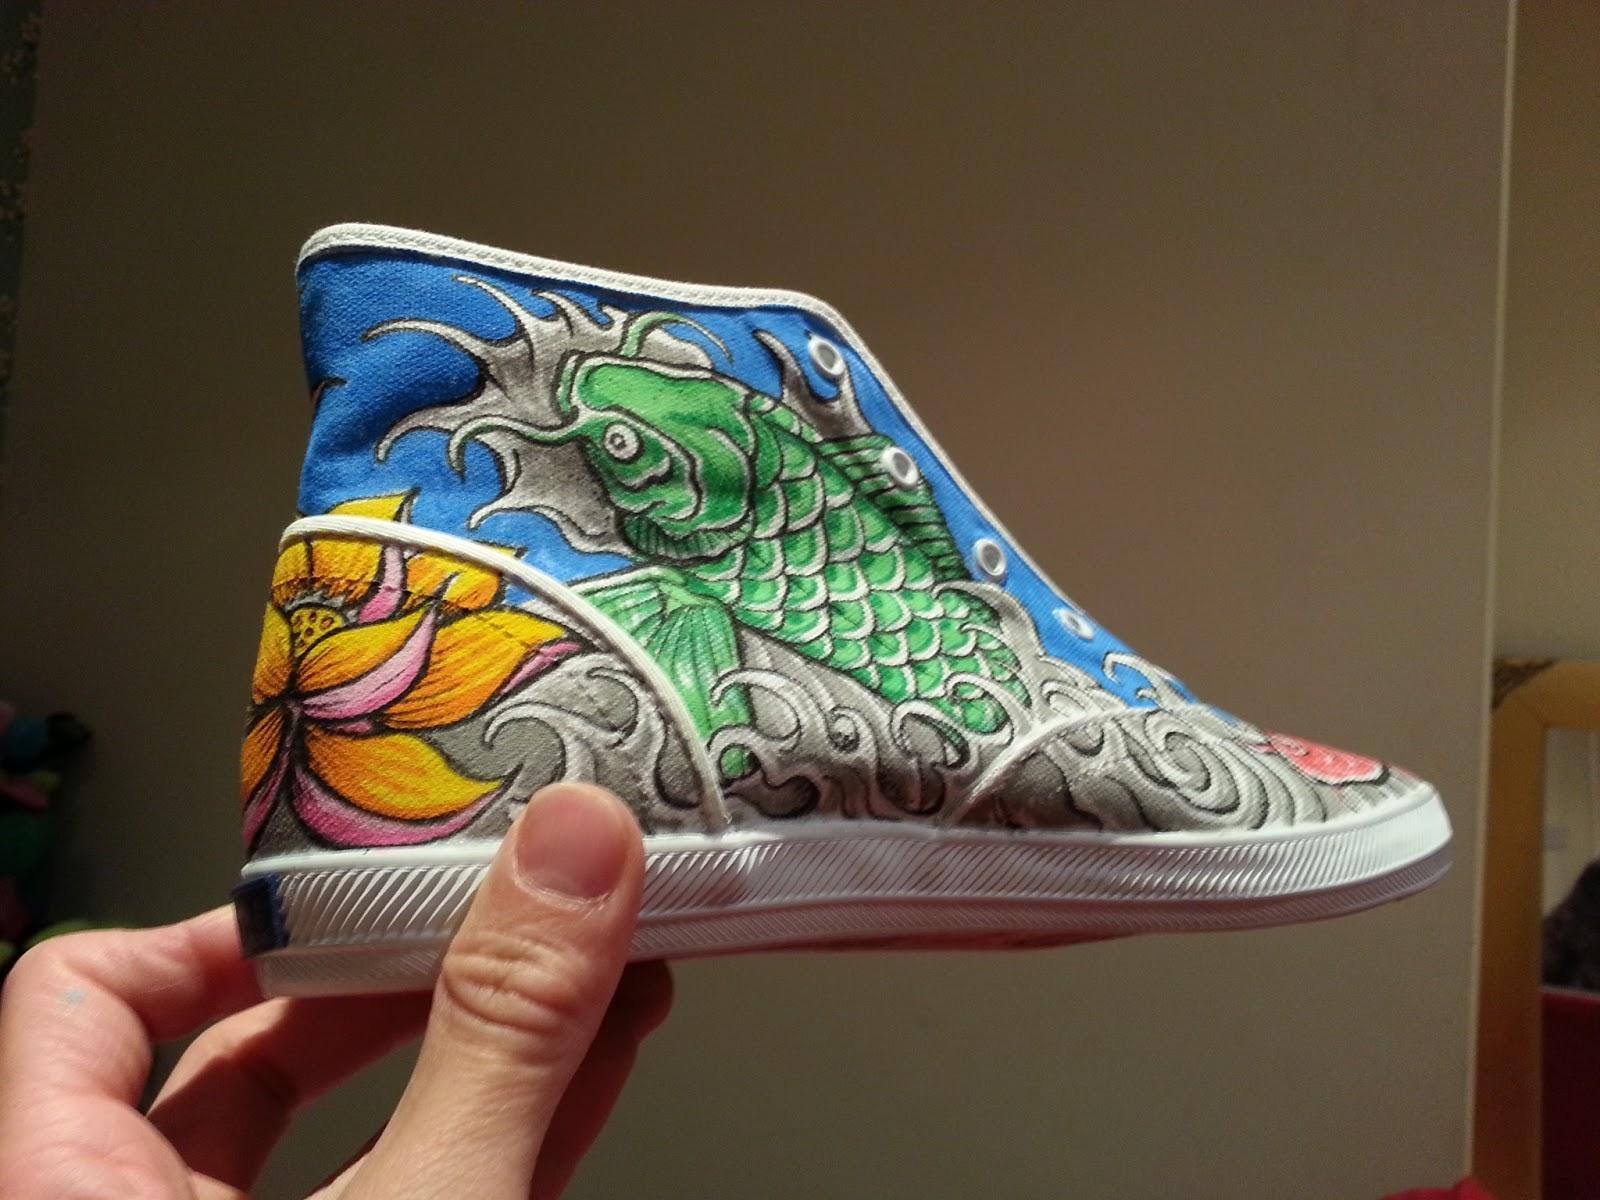 Drawn shoe japanese The so Art: are koi